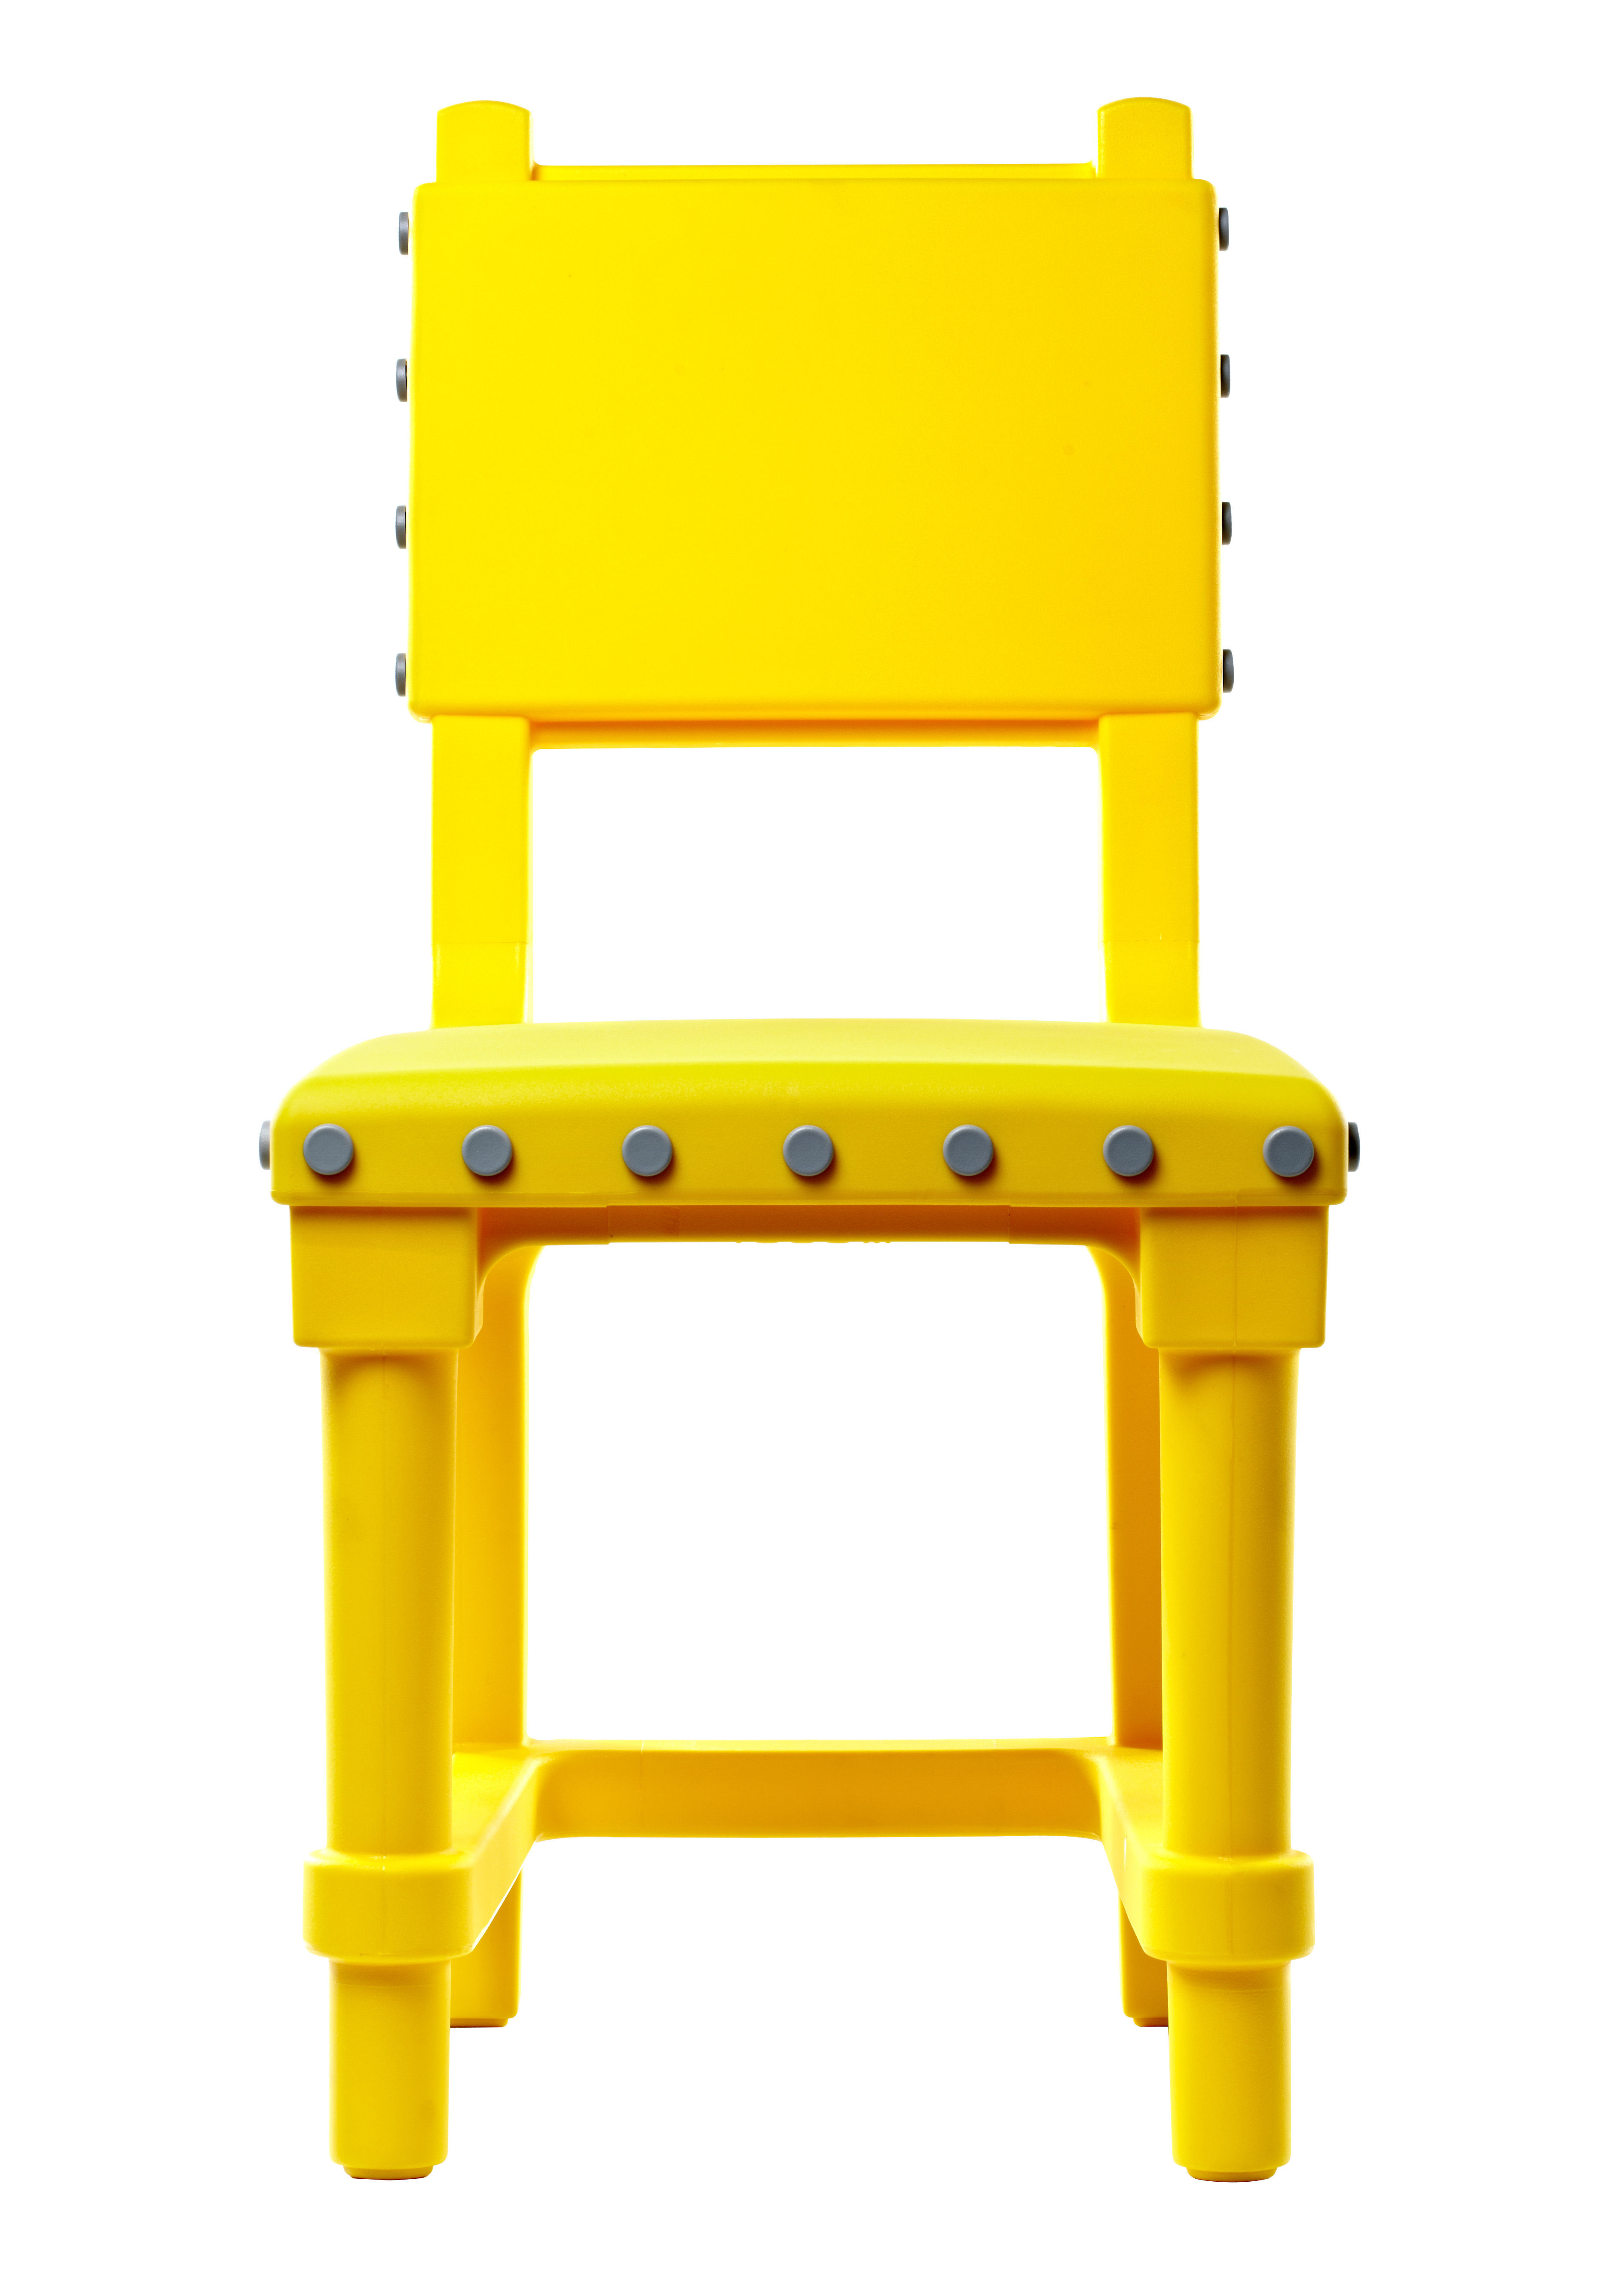 chaise gothic chair plastique jaune boutons gris clair moooi. Black Bedroom Furniture Sets. Home Design Ideas